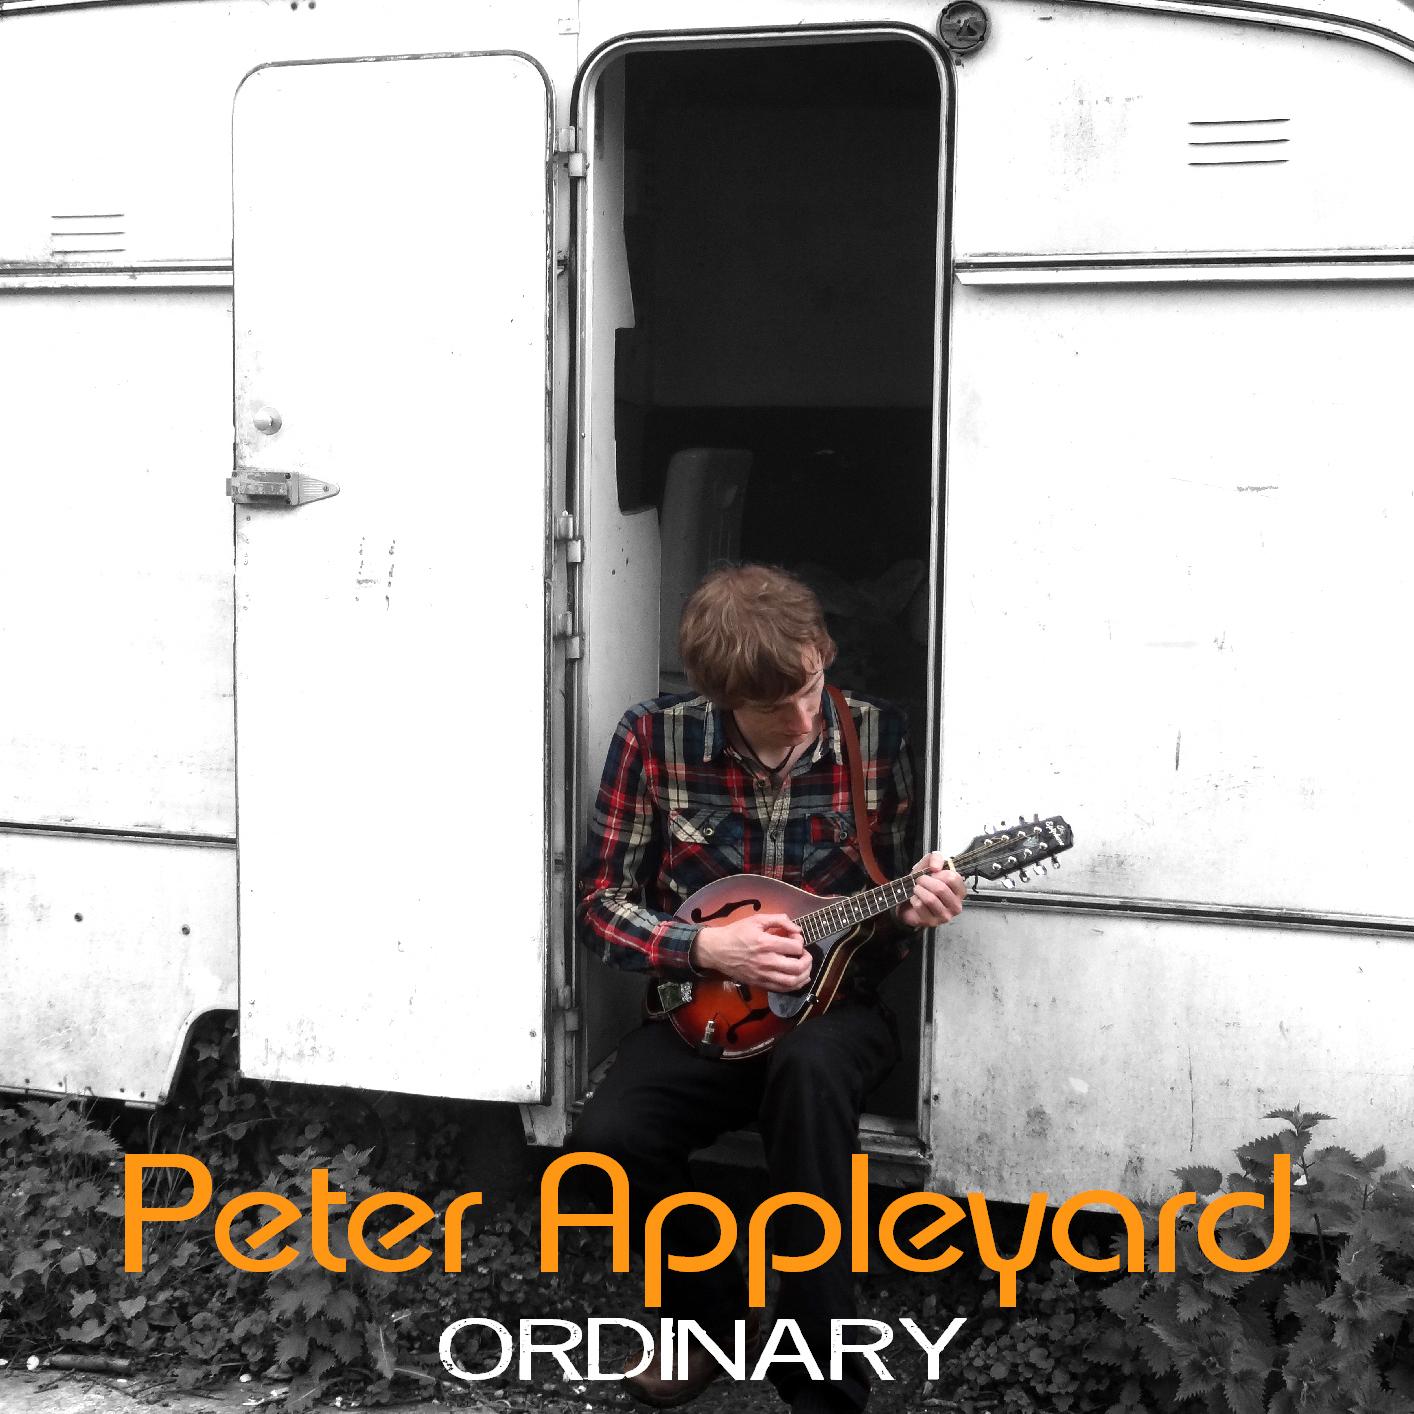 Ordinary - CD Single - Peter Appleyard